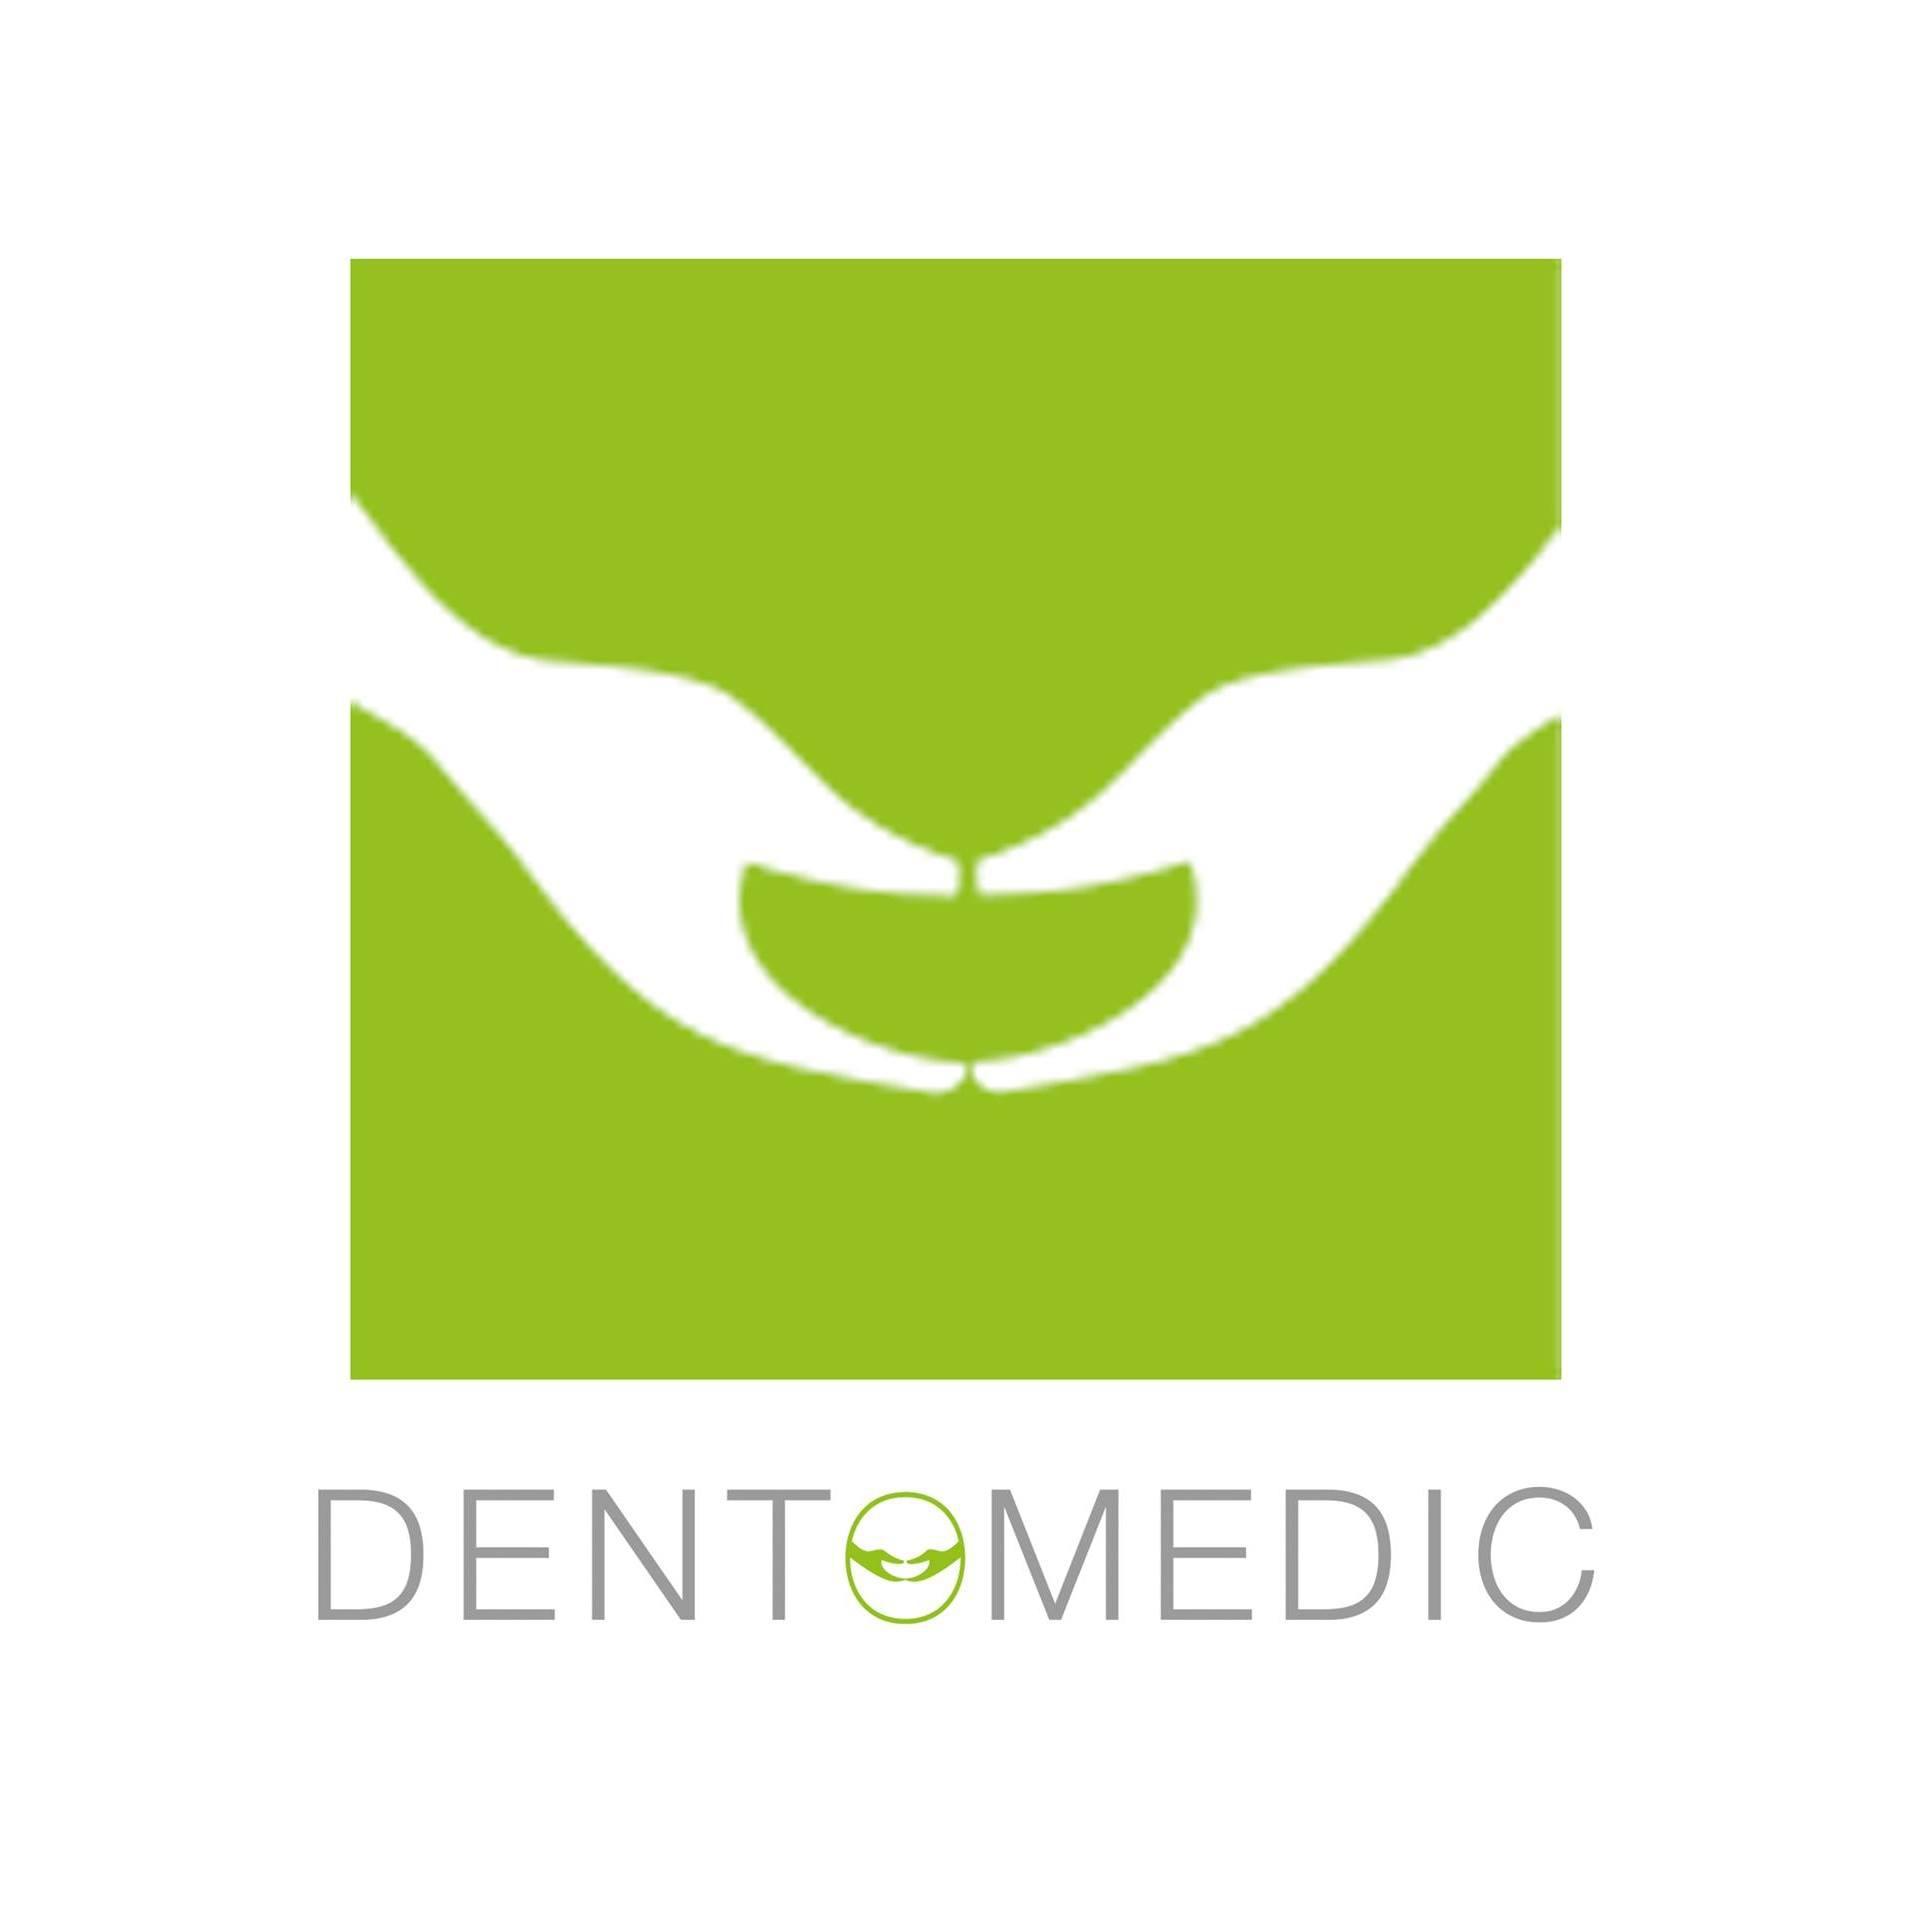 Dentomedic